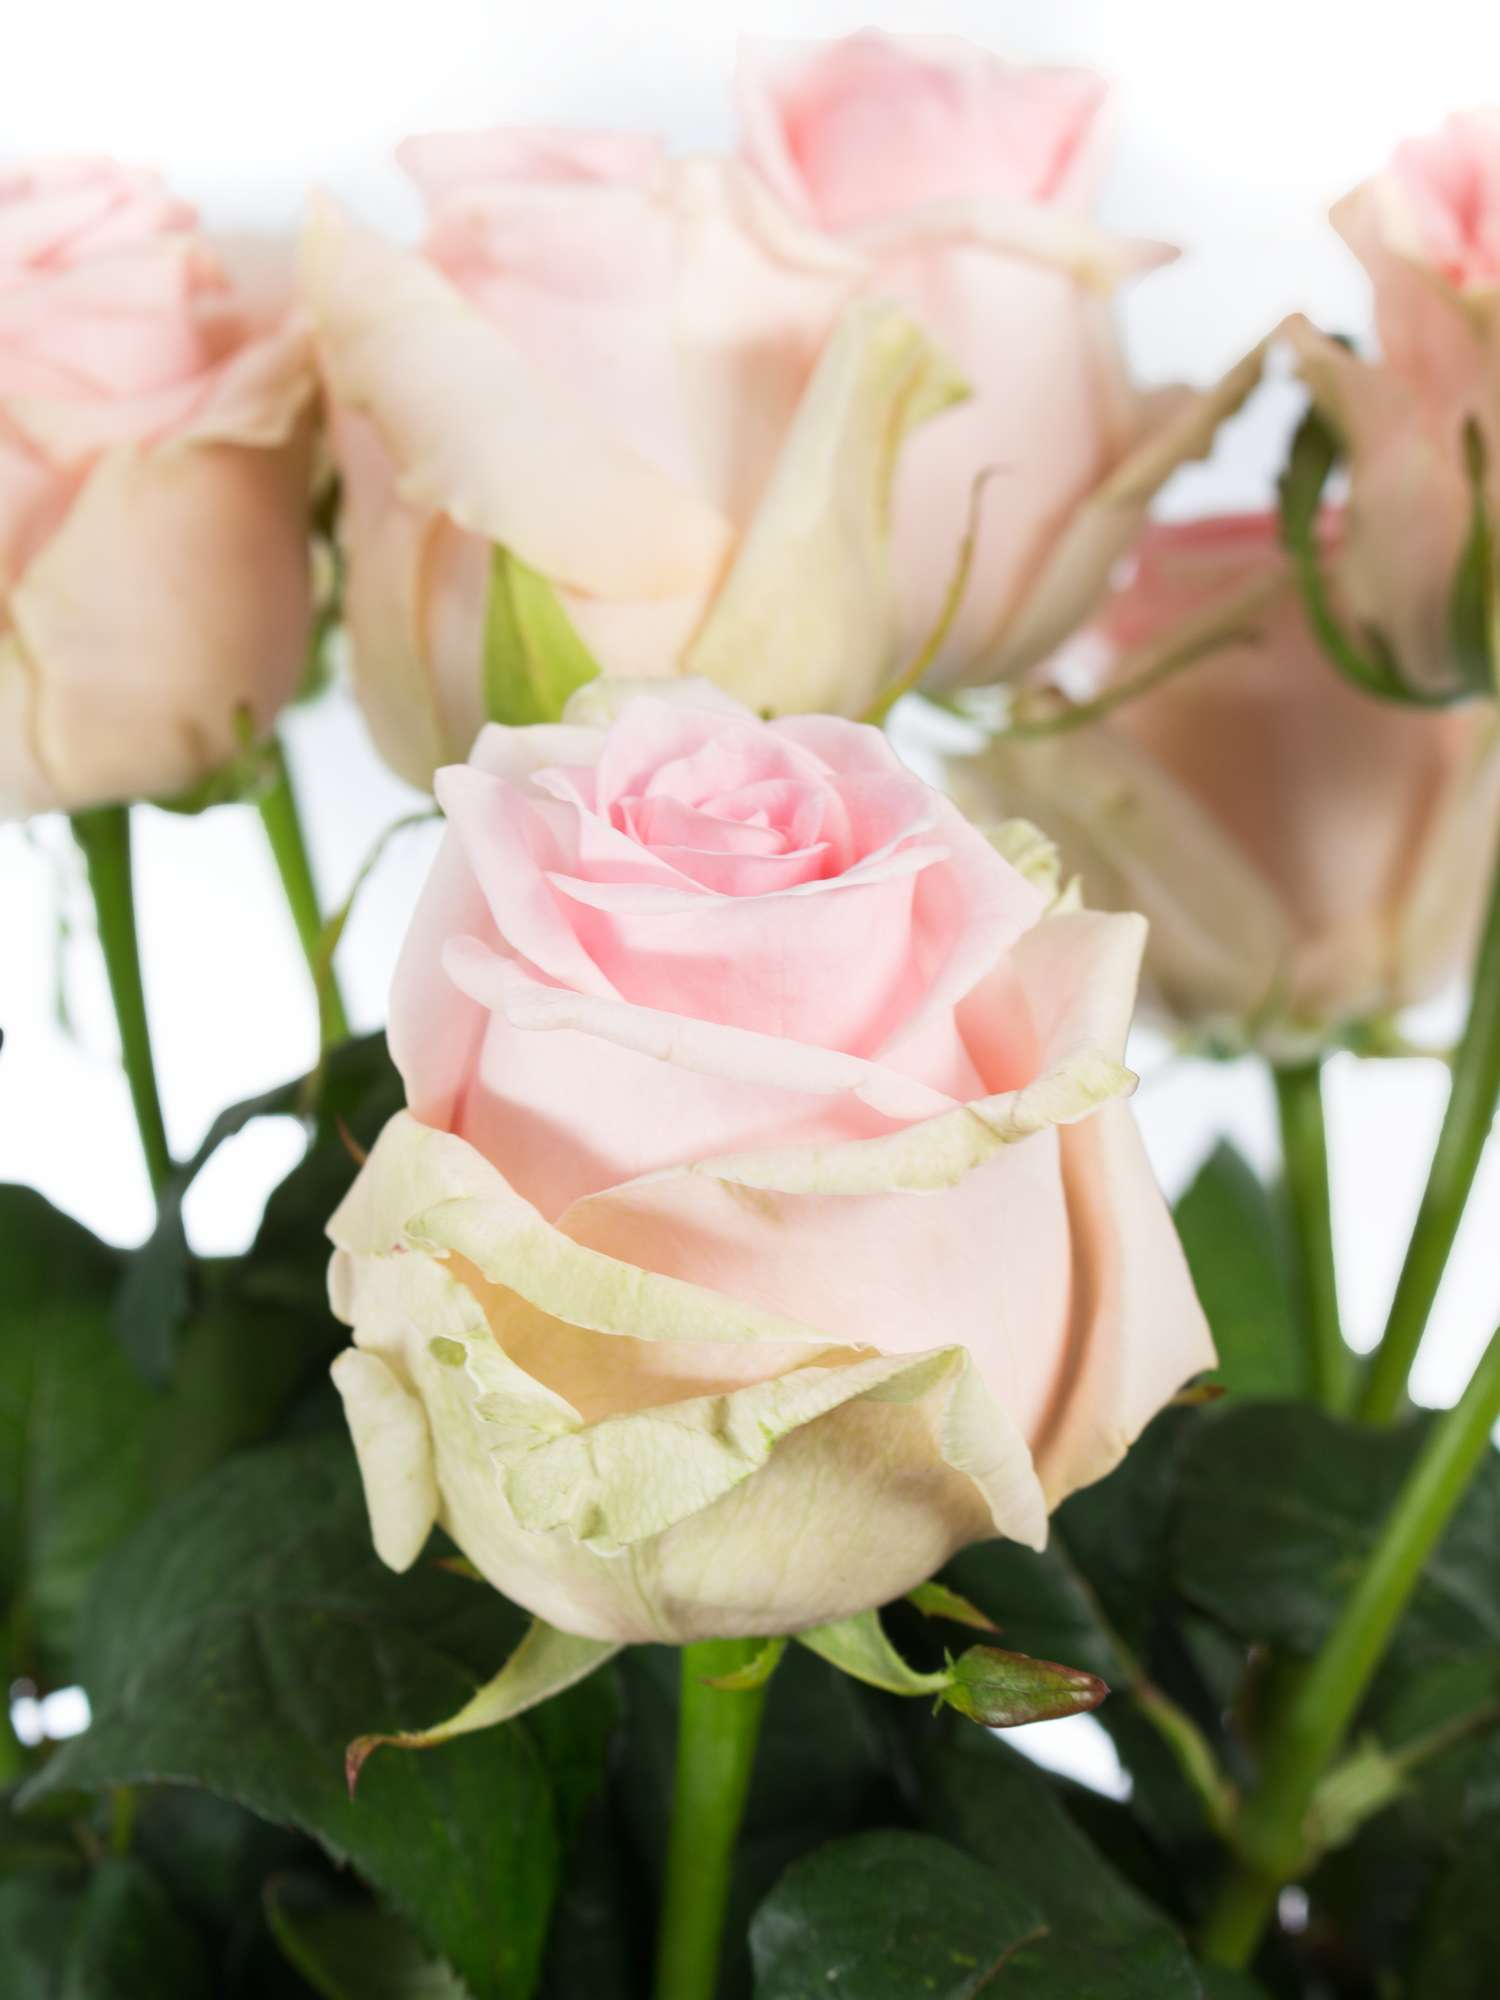 rosen sweet dolomiti rosa bestellen blumigo. Black Bedroom Furniture Sets. Home Design Ideas